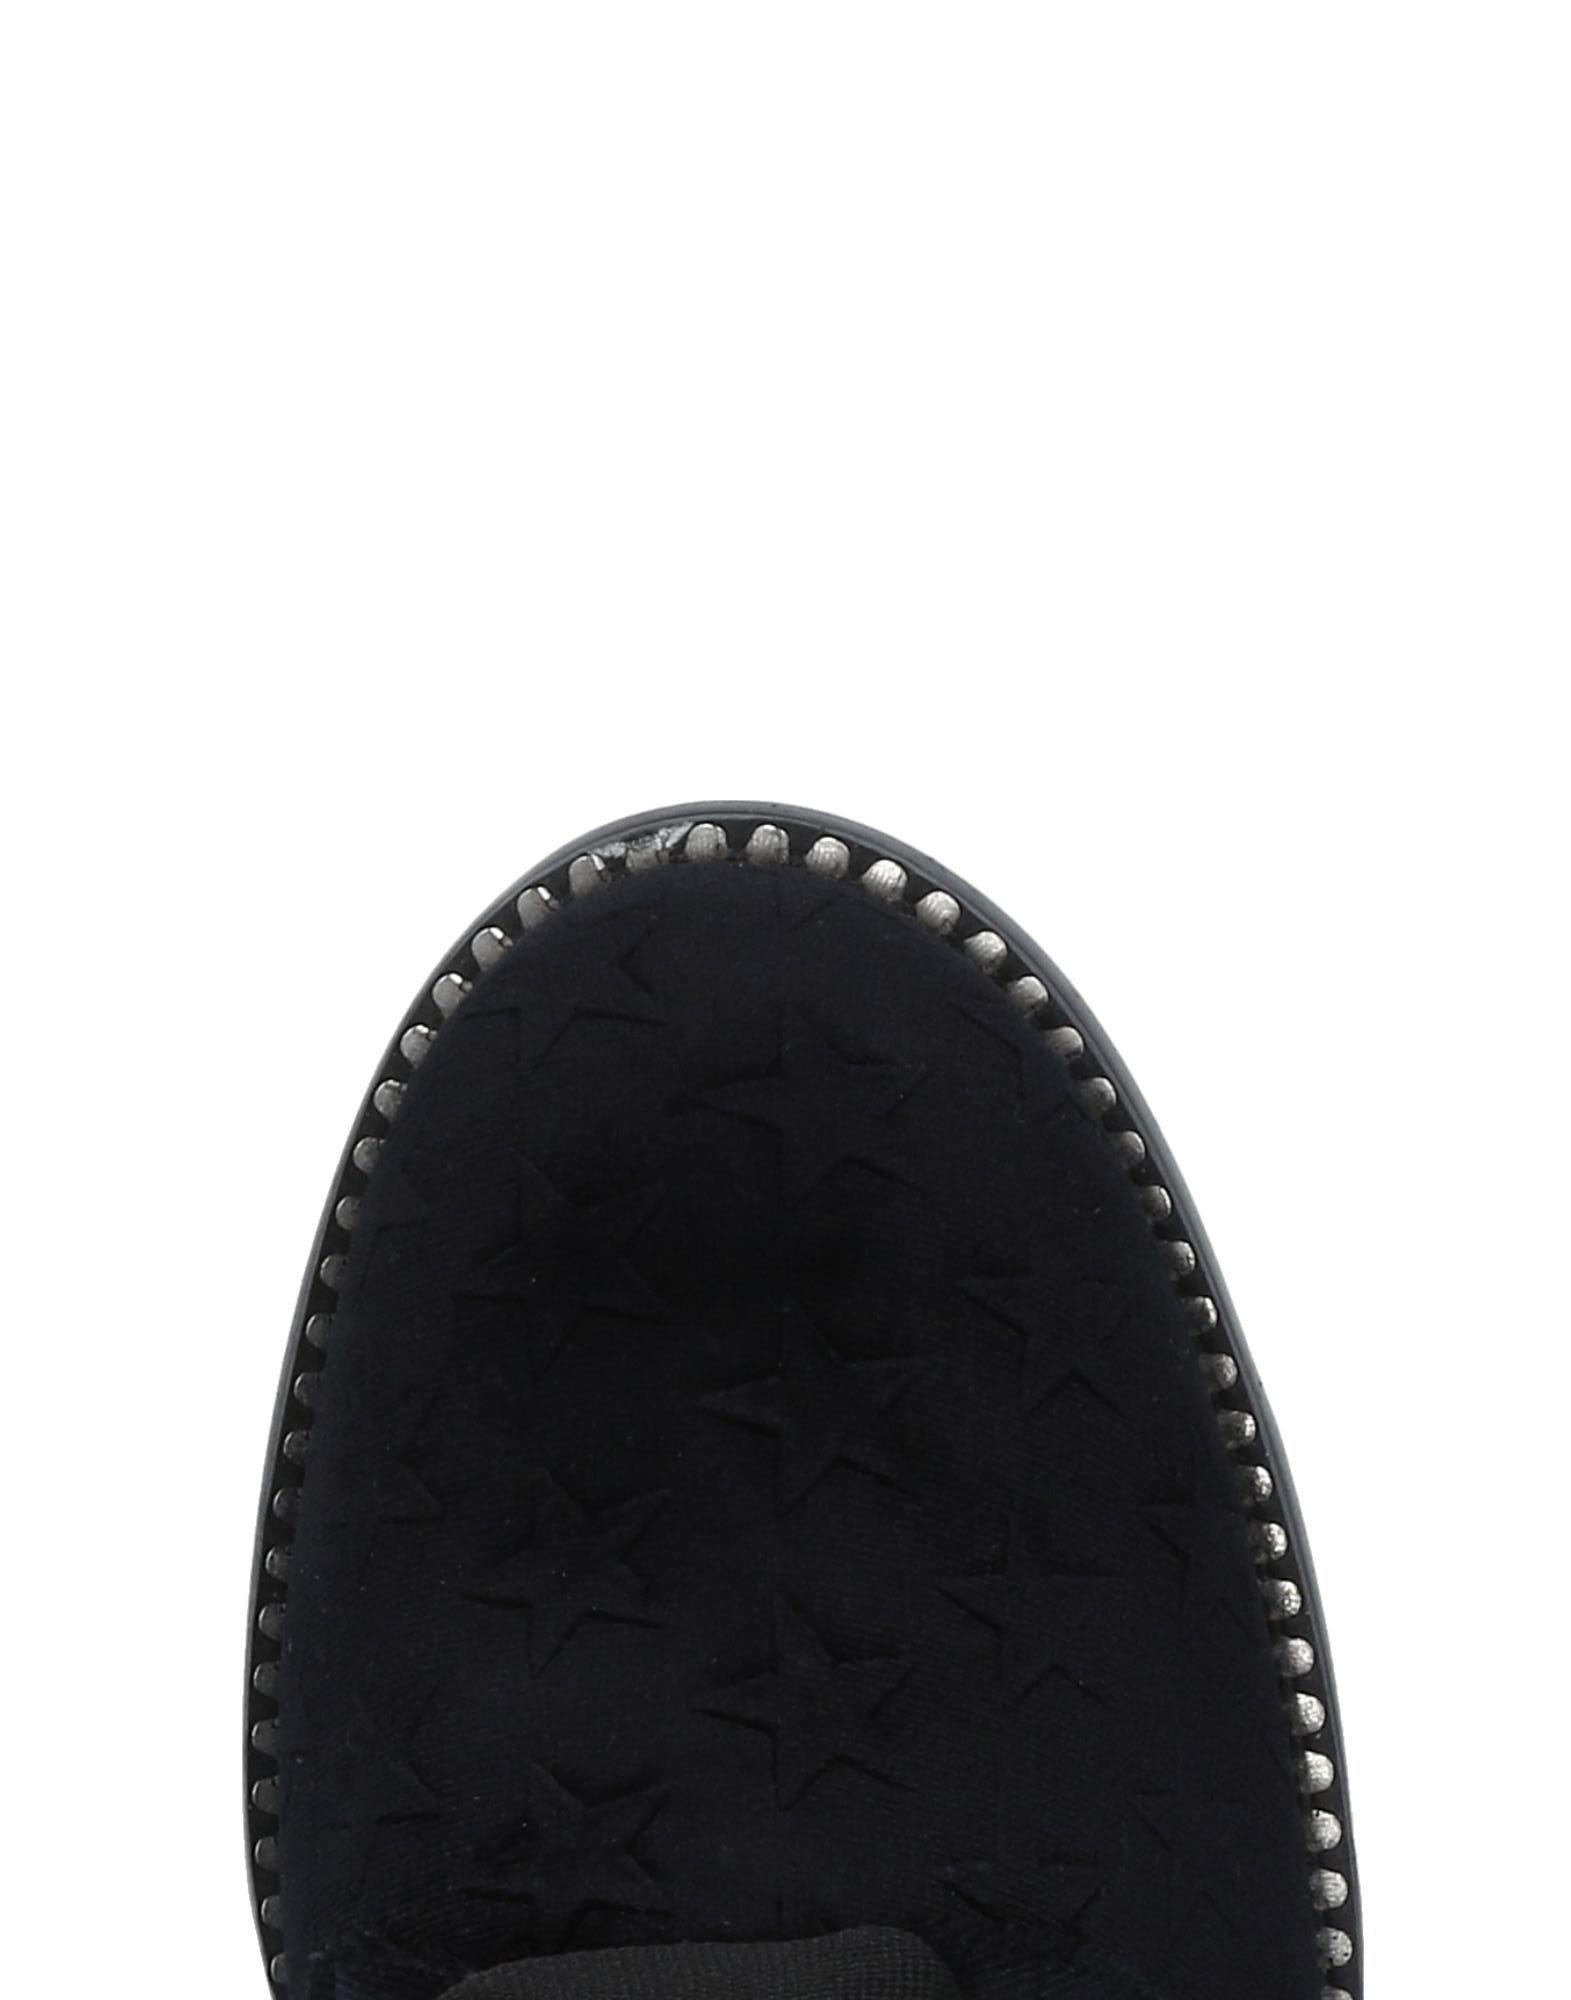 Haltbare Schuhe Mode billige Schuhe Haltbare Replay Schnürschuhe Damen  11493870SS Heiße Schuhe c7873e